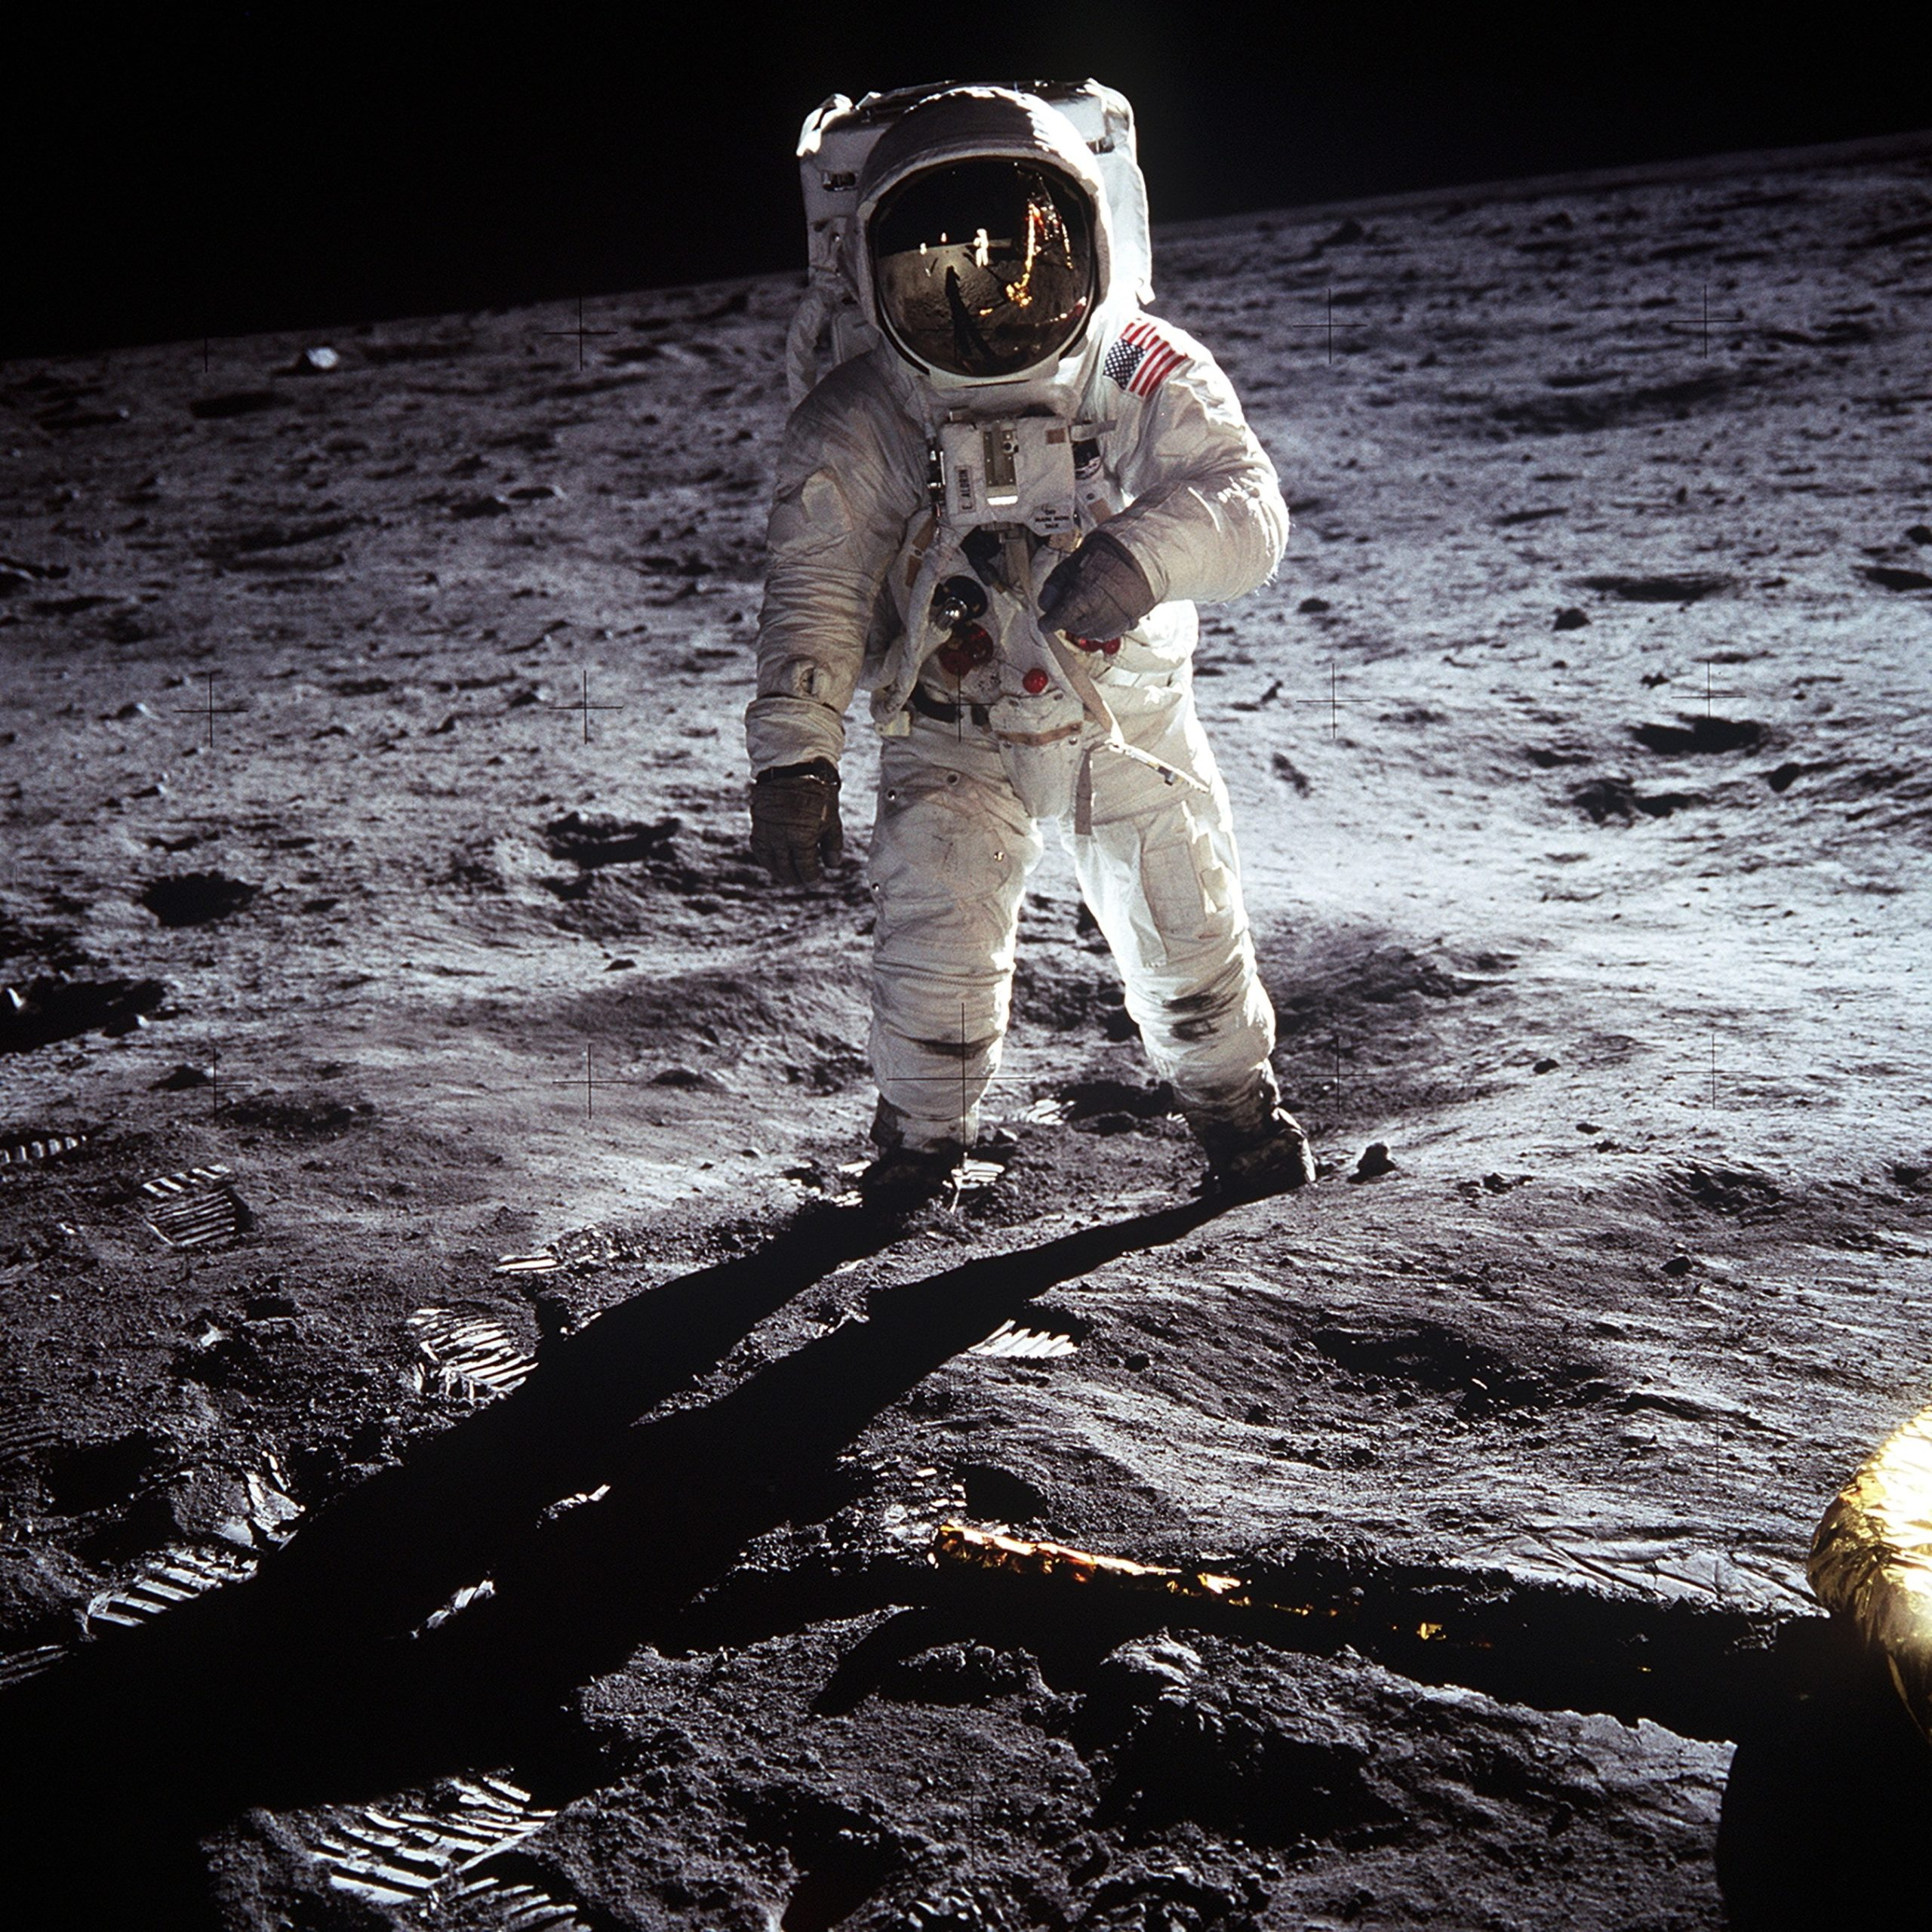 Photo of an astronaut on the moon.